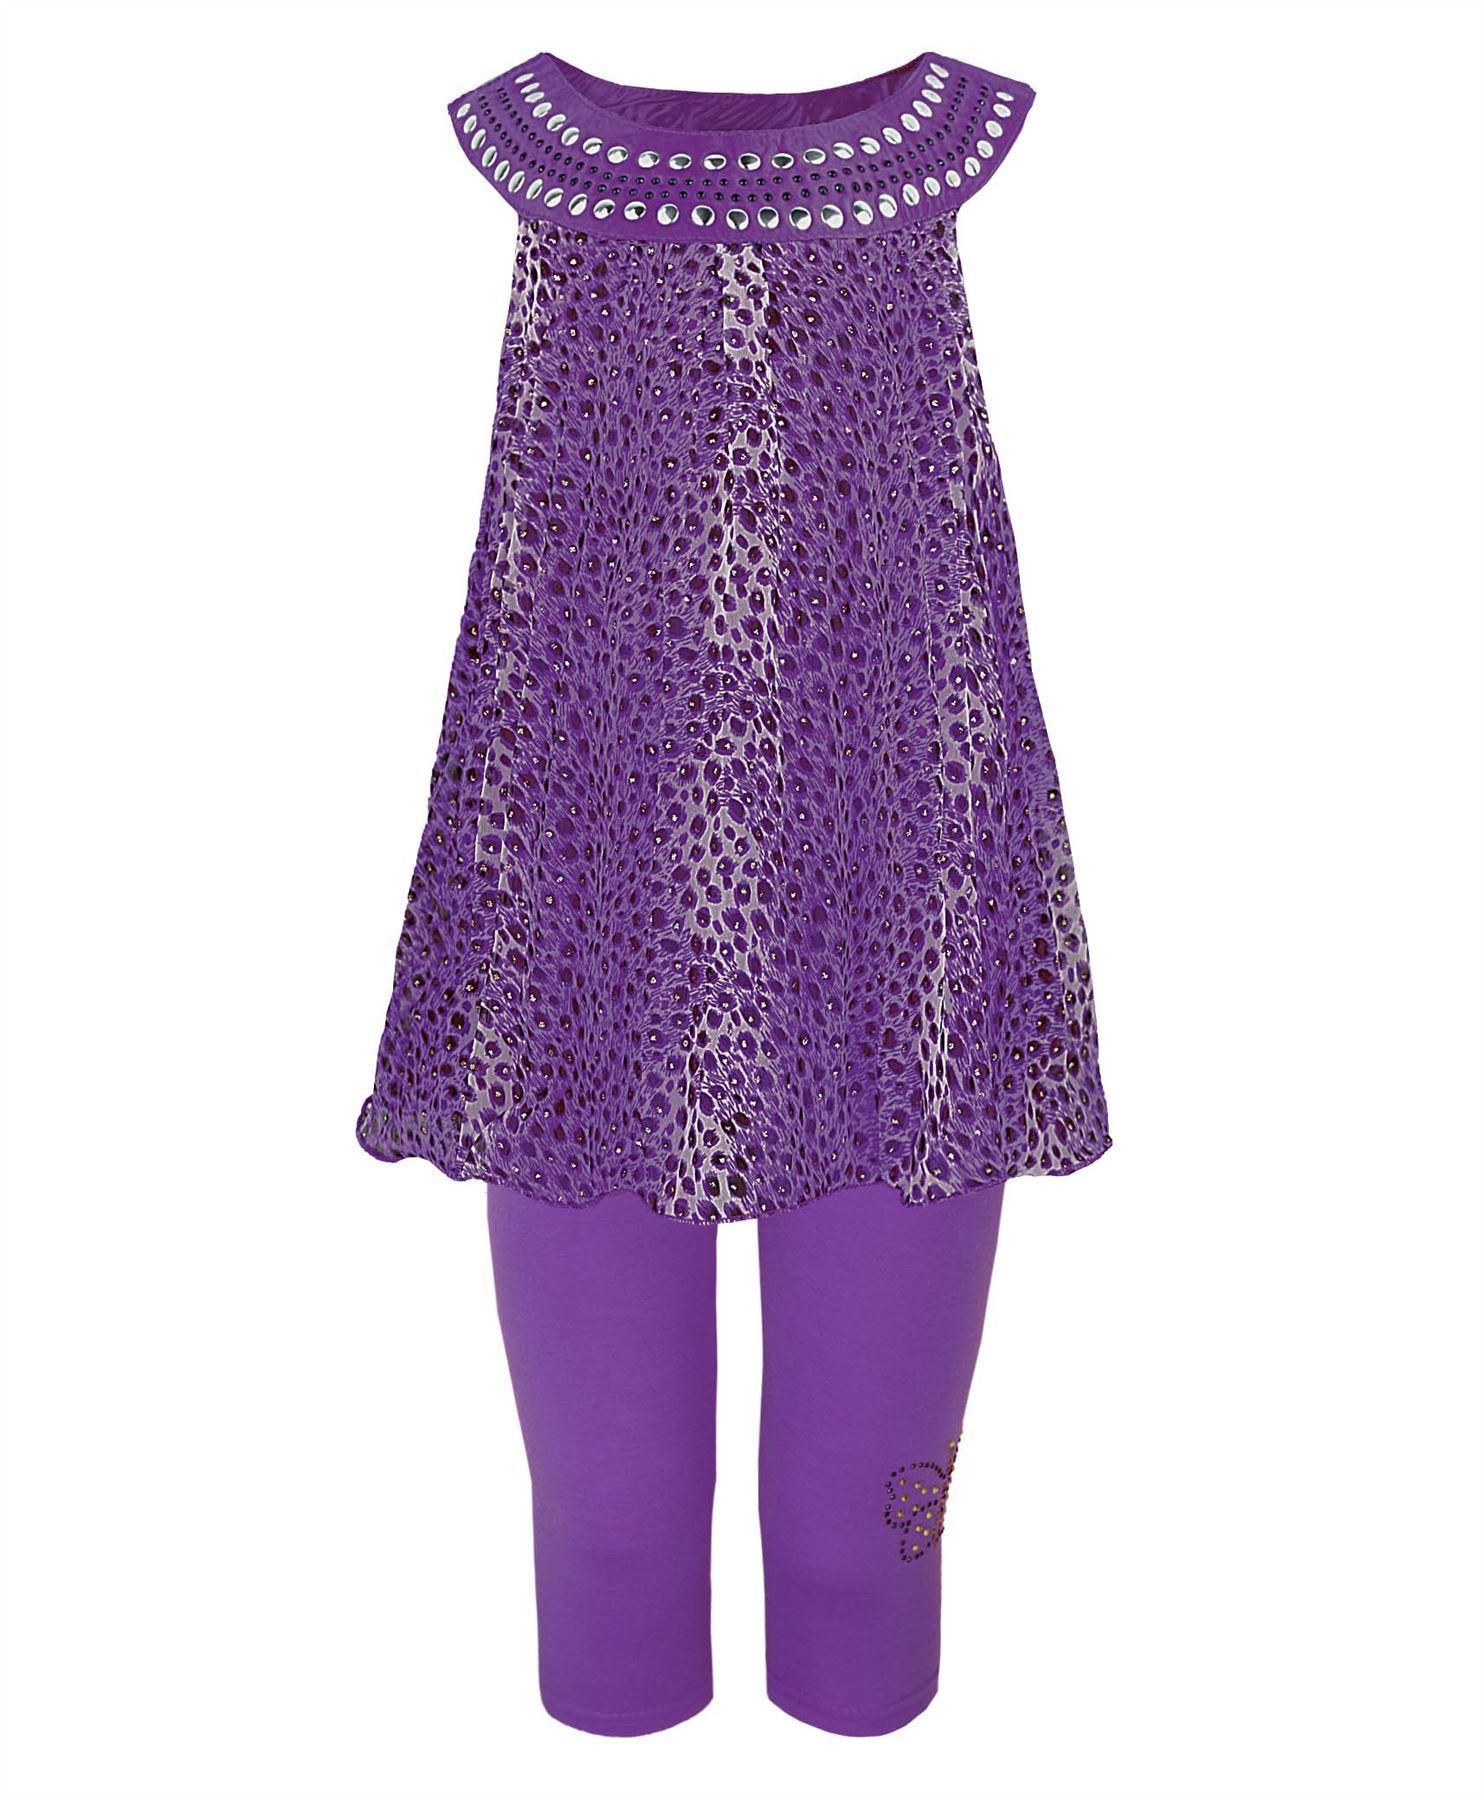 GIRLS SLEEVELESS DRESS GLITTER ANIMAL PRINT CHIFFON TOP & LEGGINGS KIDS 1-12Y